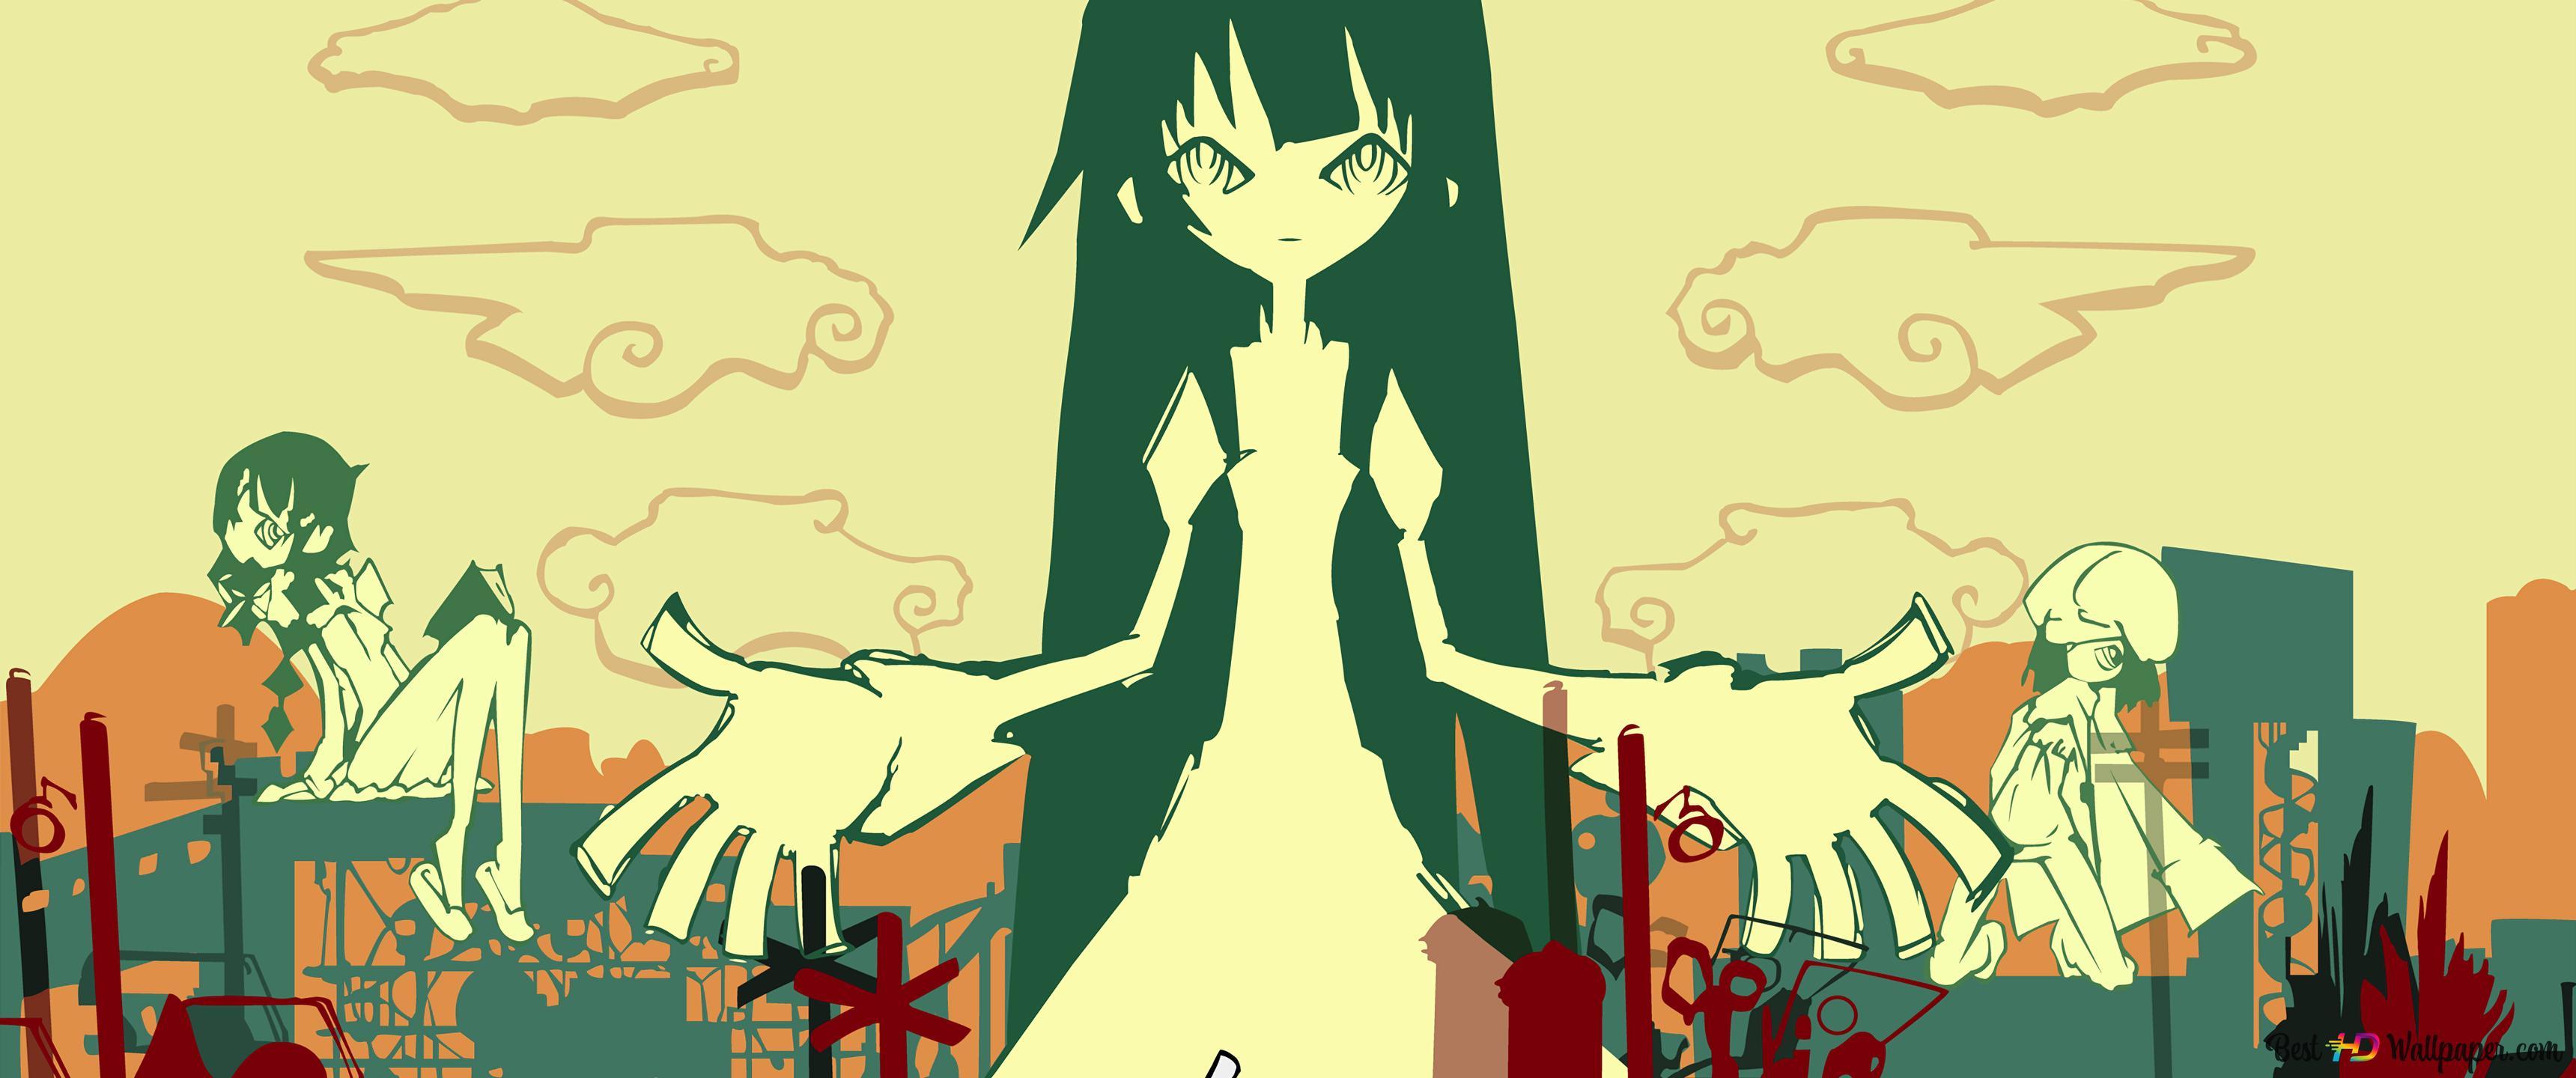 Monogatari Hd Wallpaper Download